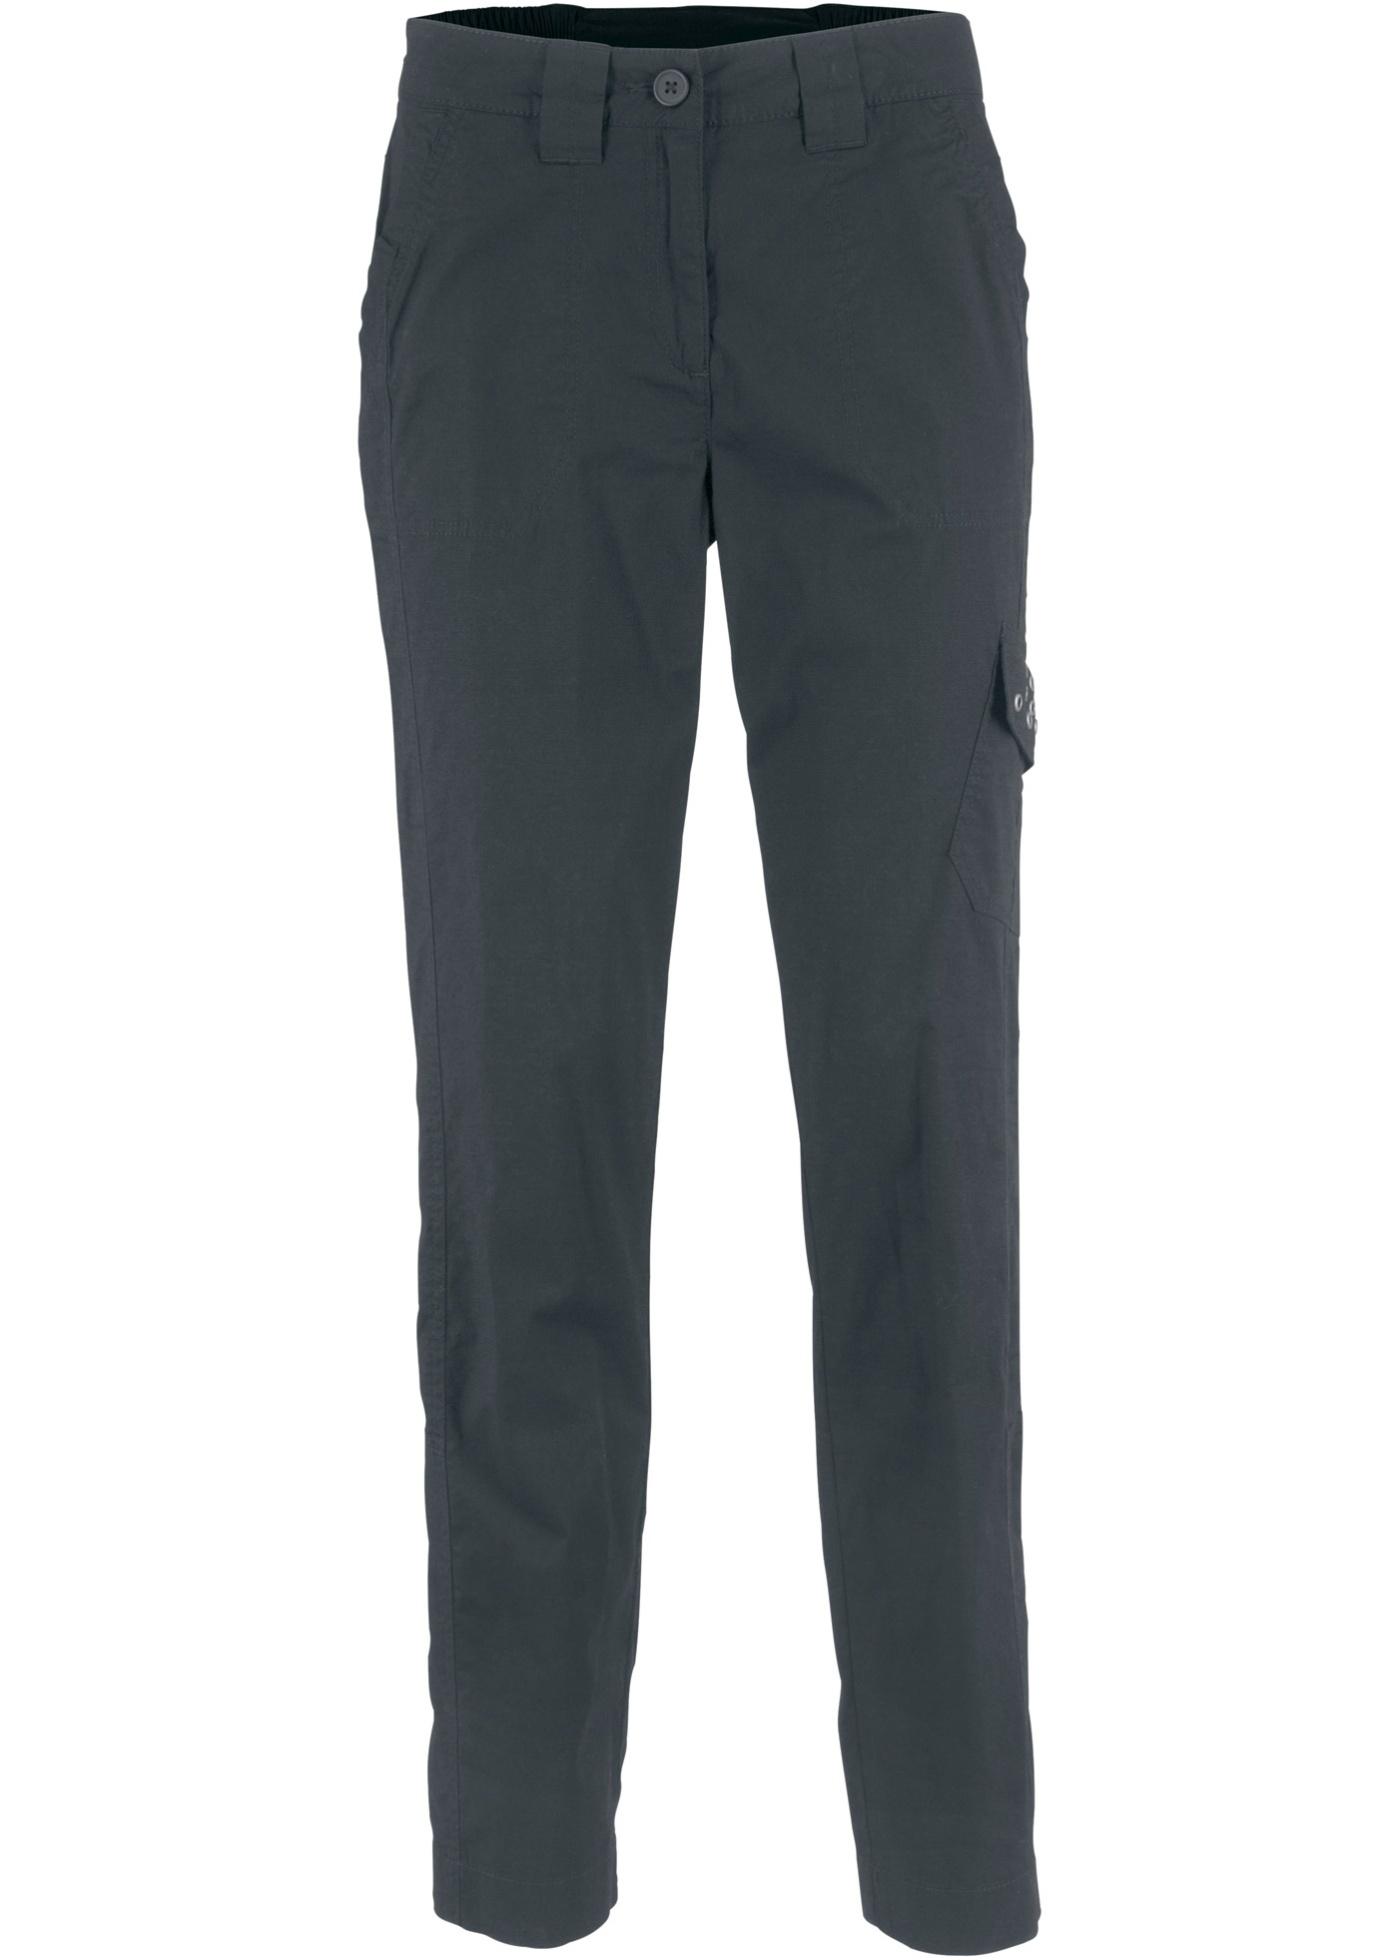 Strečové kargo kalhoty Papertouch - Černá